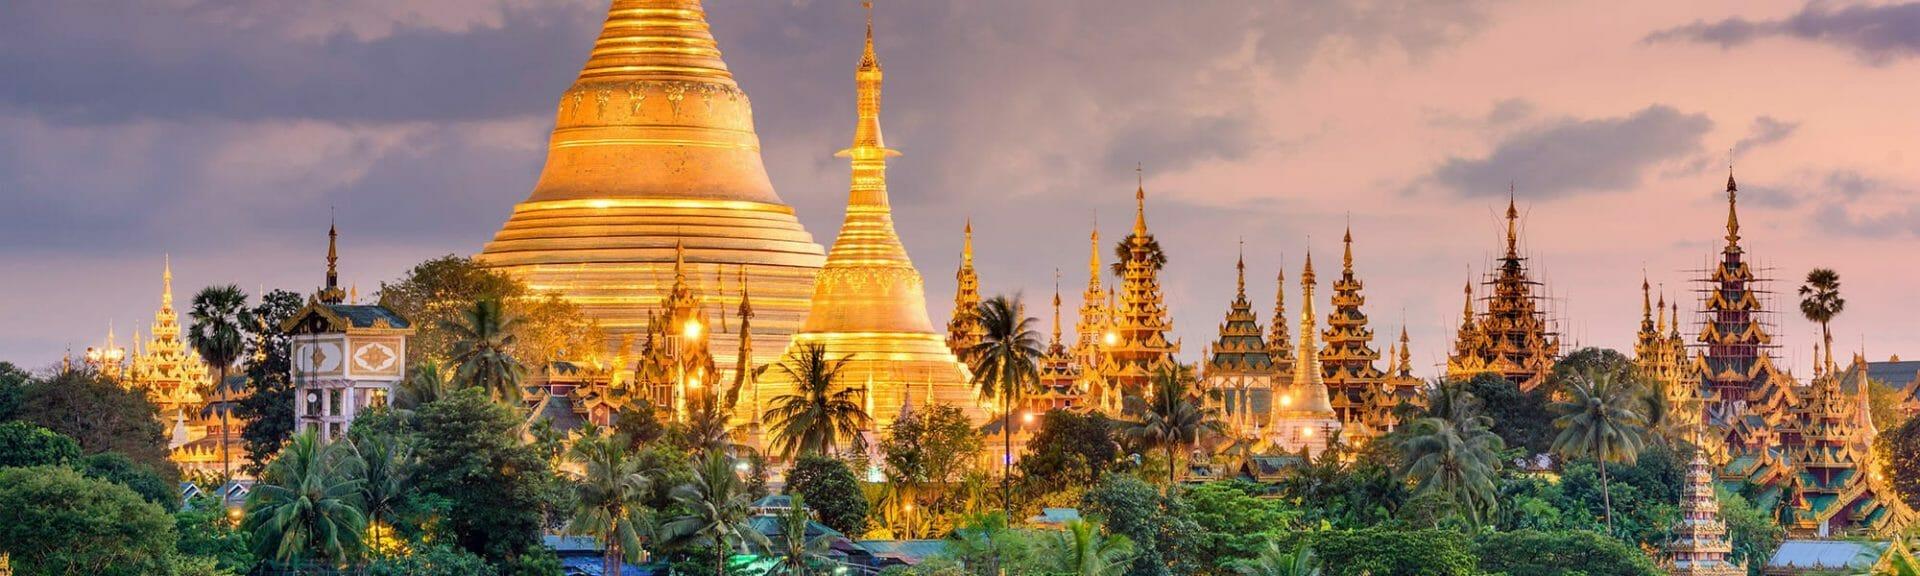 Yangoon_Shwedagon